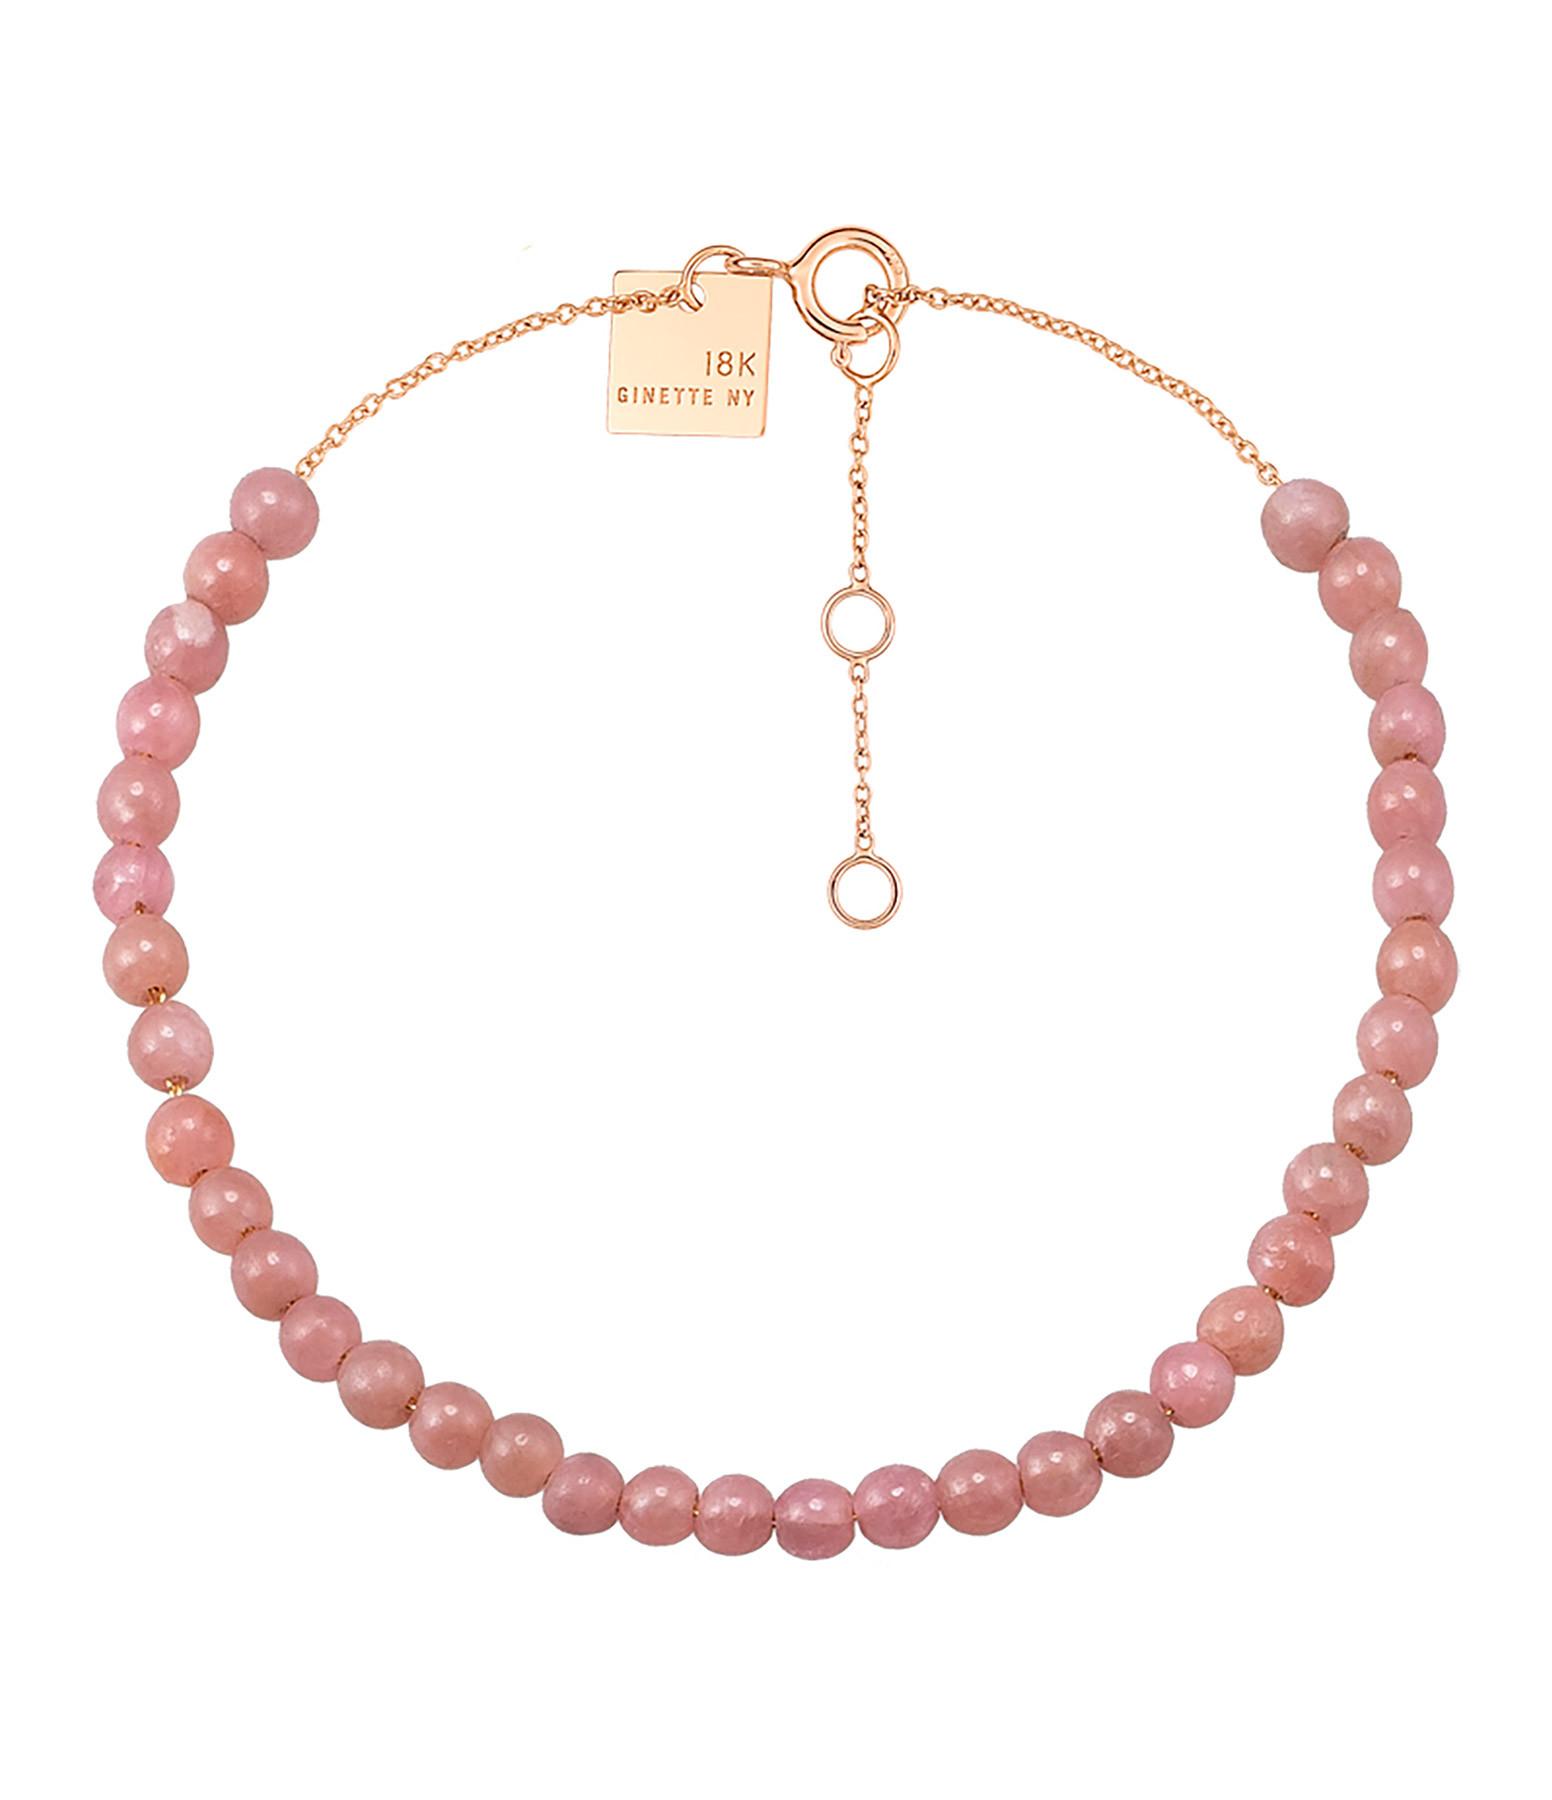 GINETTE NY - Bracelet Maria Mini Or Rose Rhodocrosite